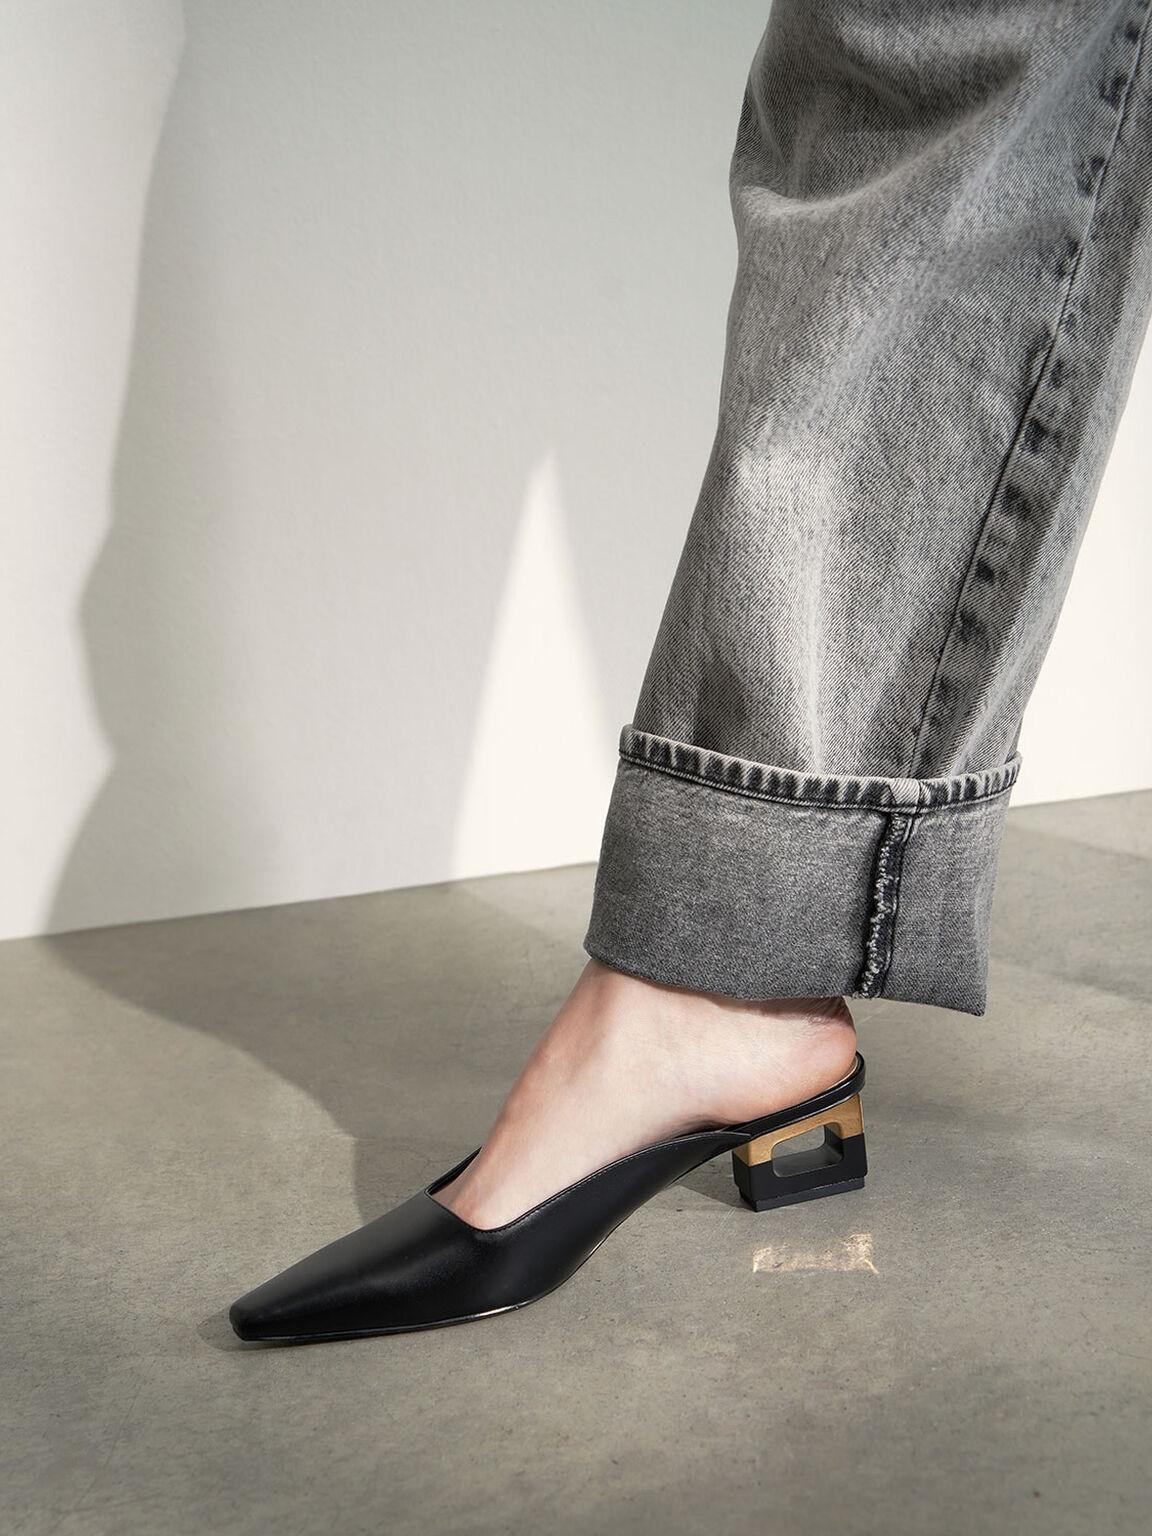 Sculptural Chrome Heel Mules, Black, hi-res